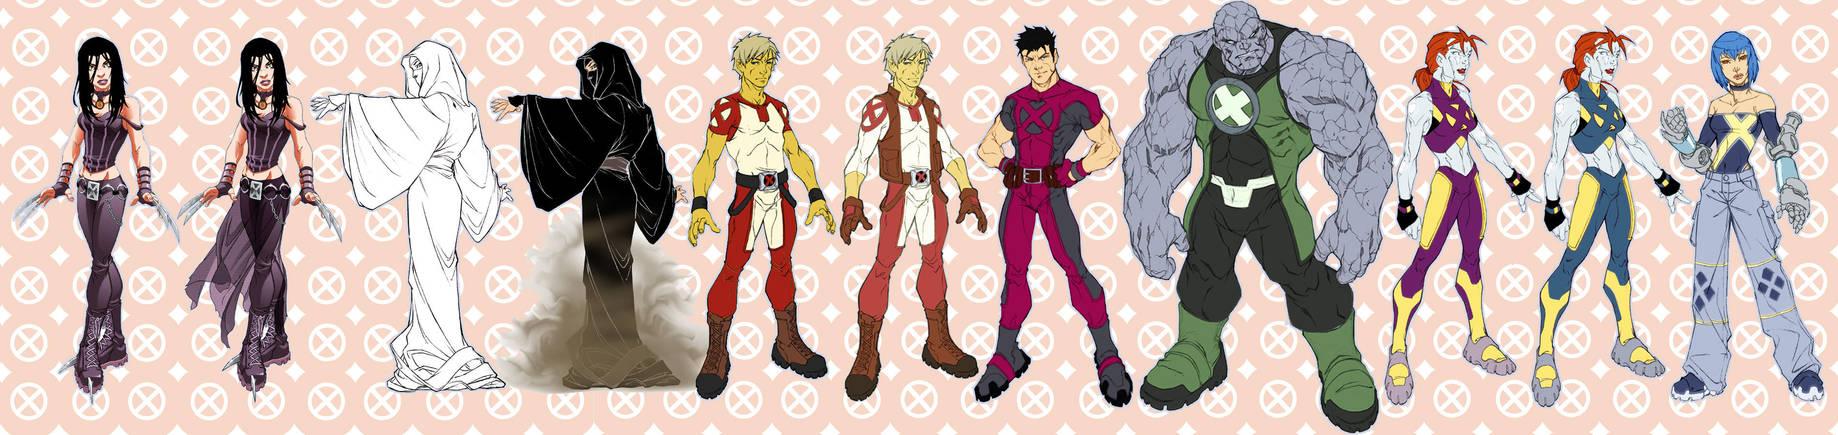 New X-Men Designs by diablo2003